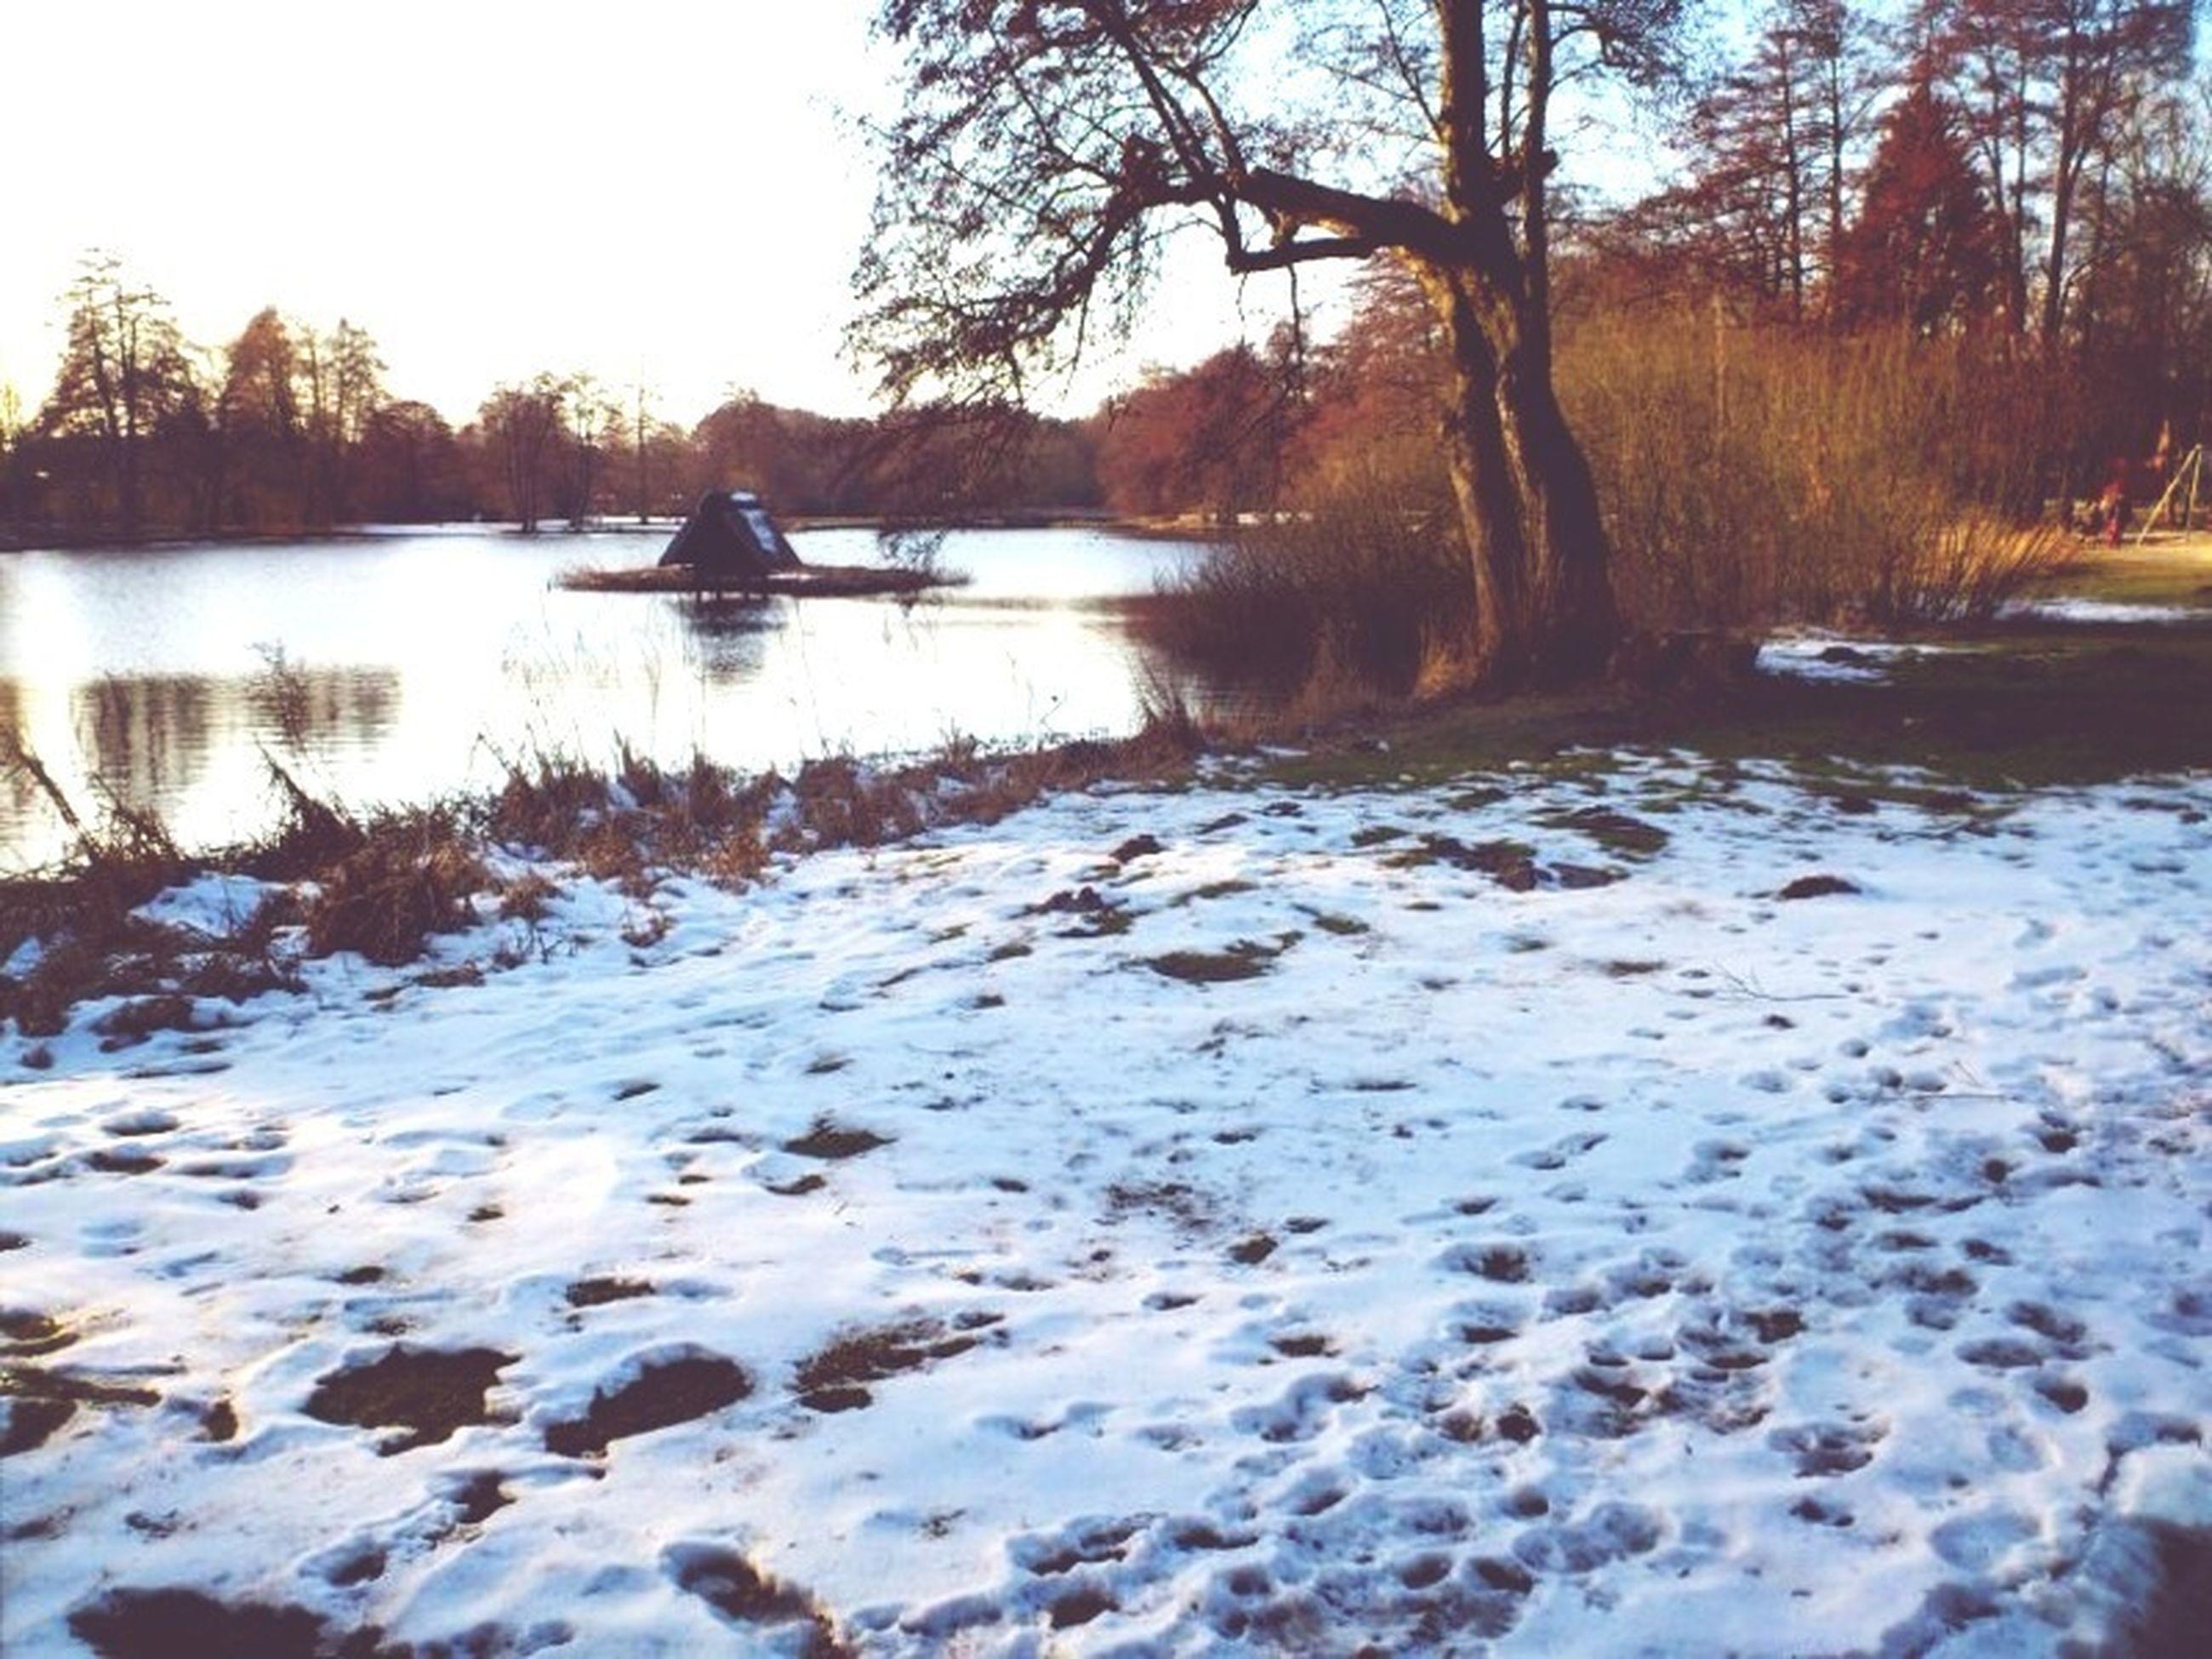 water, winter, tranquil scene, snow, tree, tranquility, cold temperature, lake, scenics, nature, beauty in nature, river, reflection, frozen, season, lakeshore, non-urban scene, forest, bare tree, sky